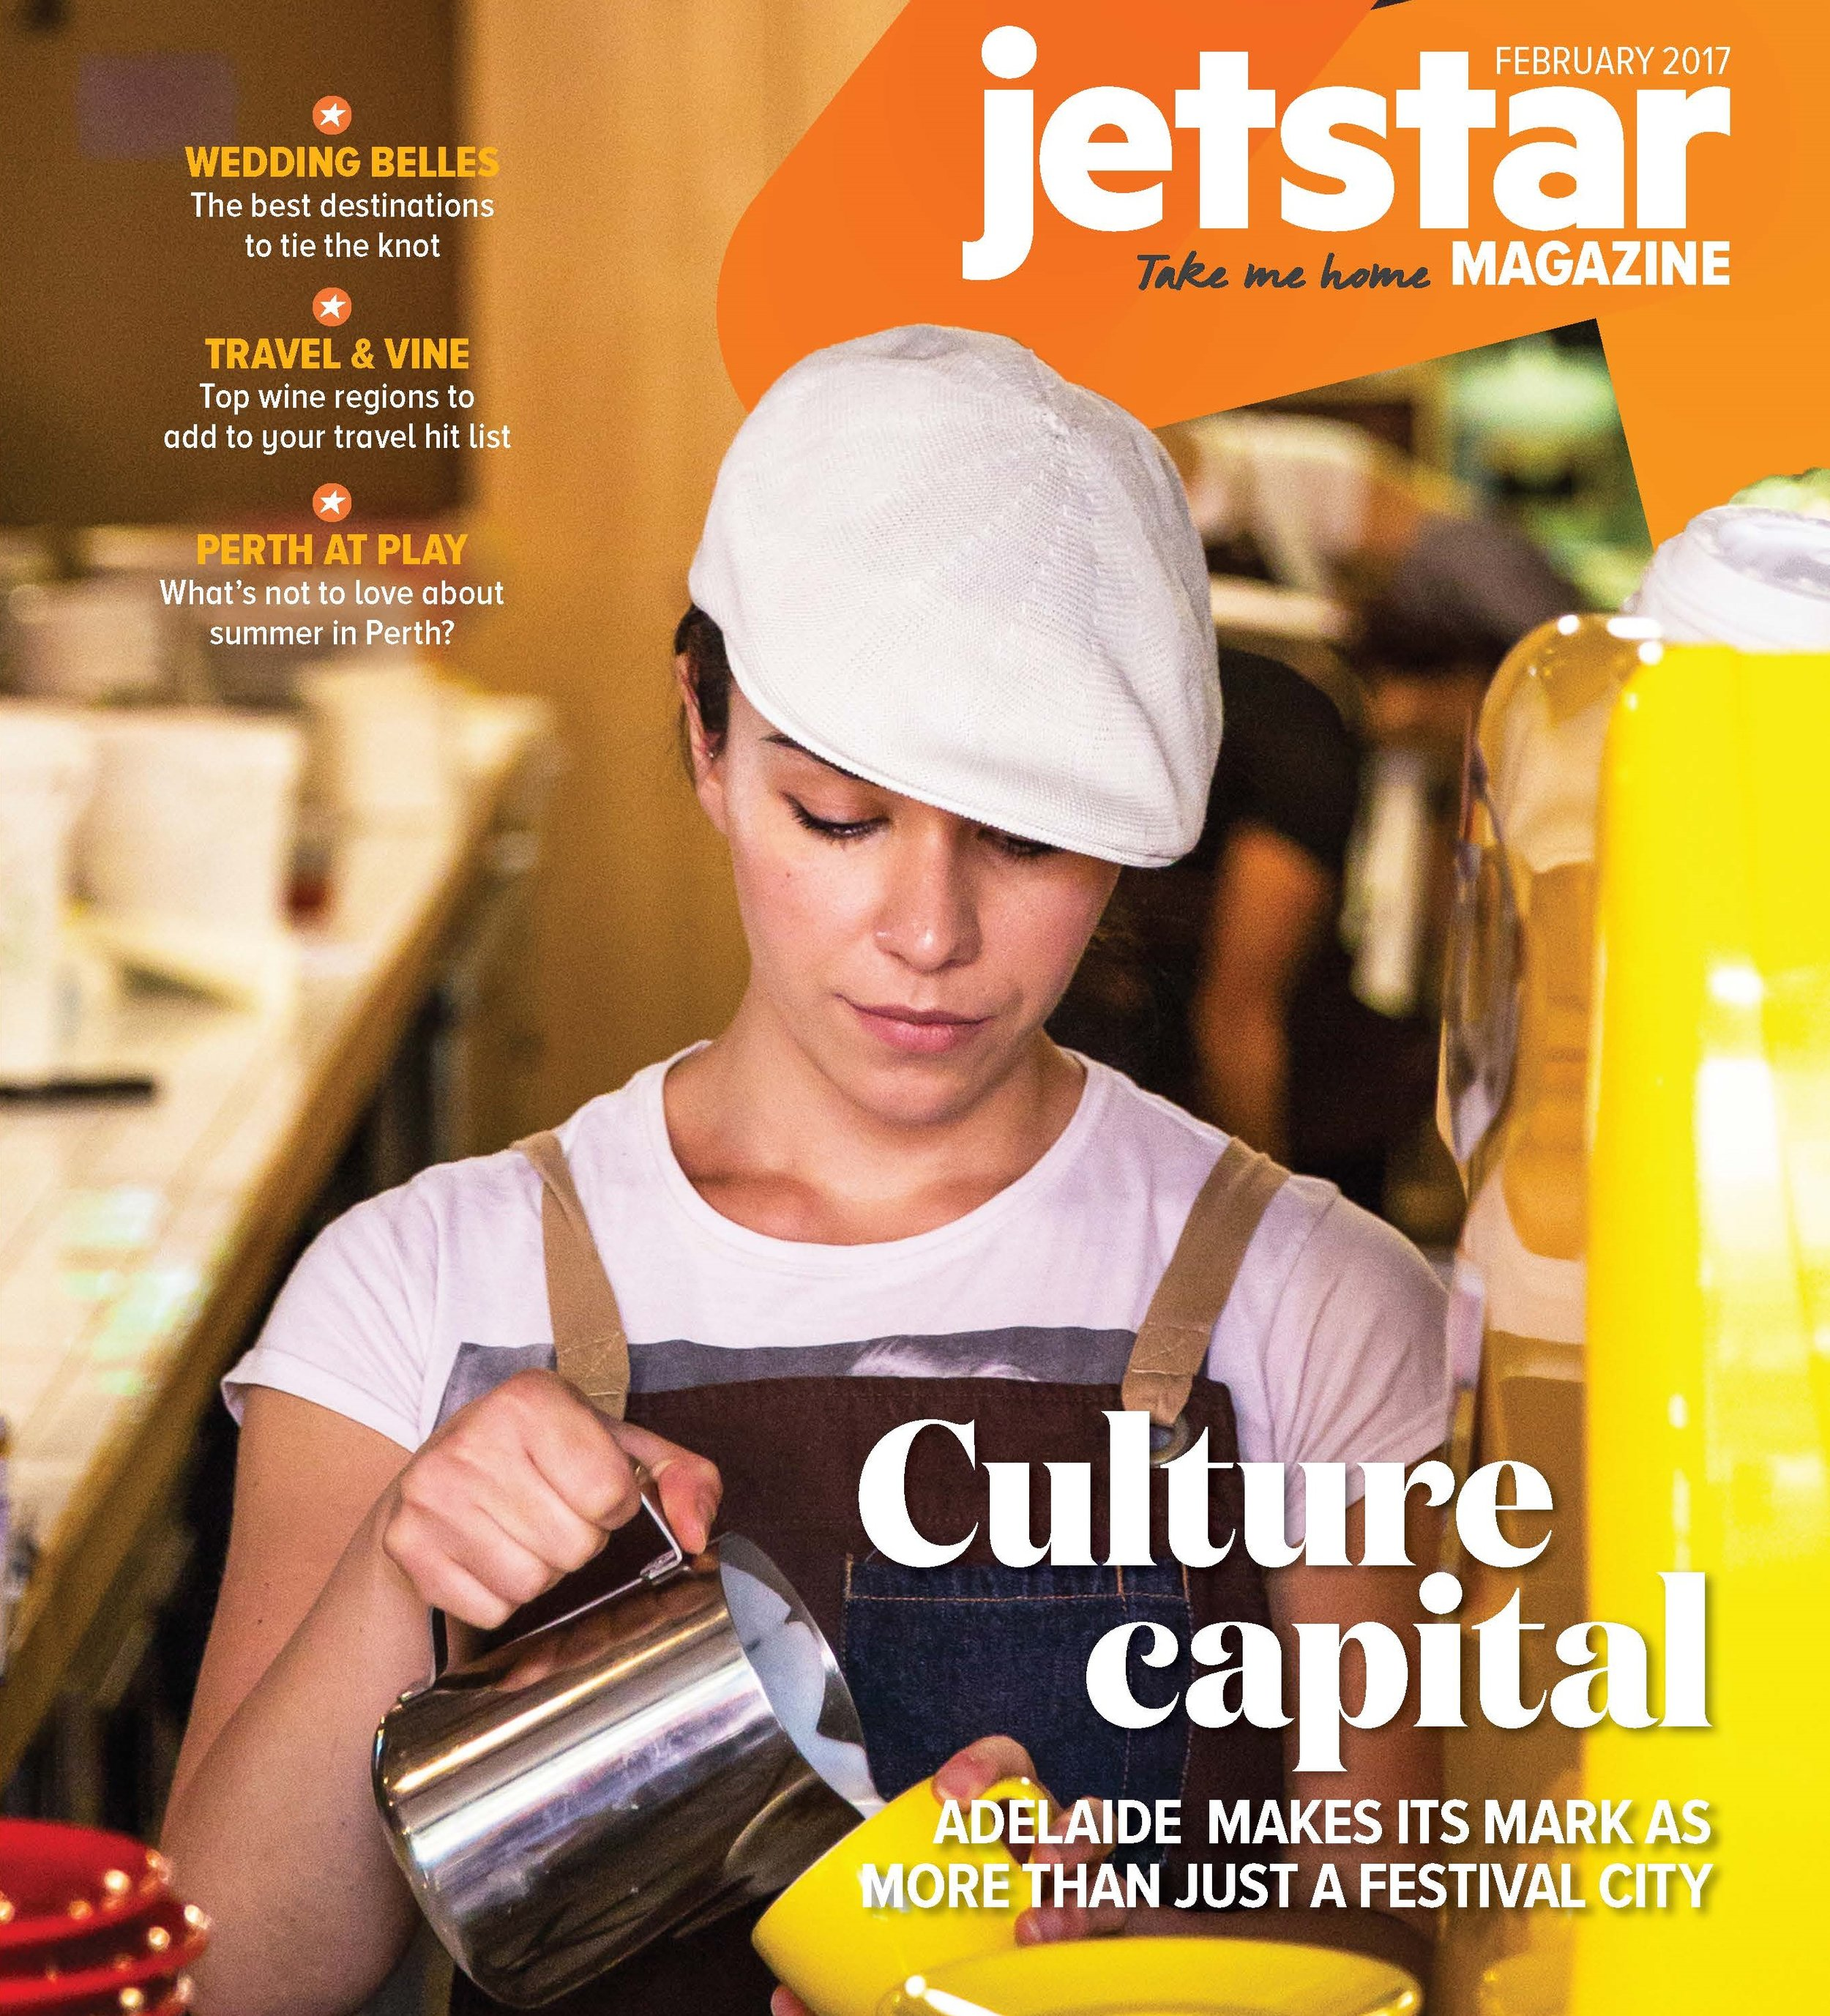 Jetstar Magazine February 2017